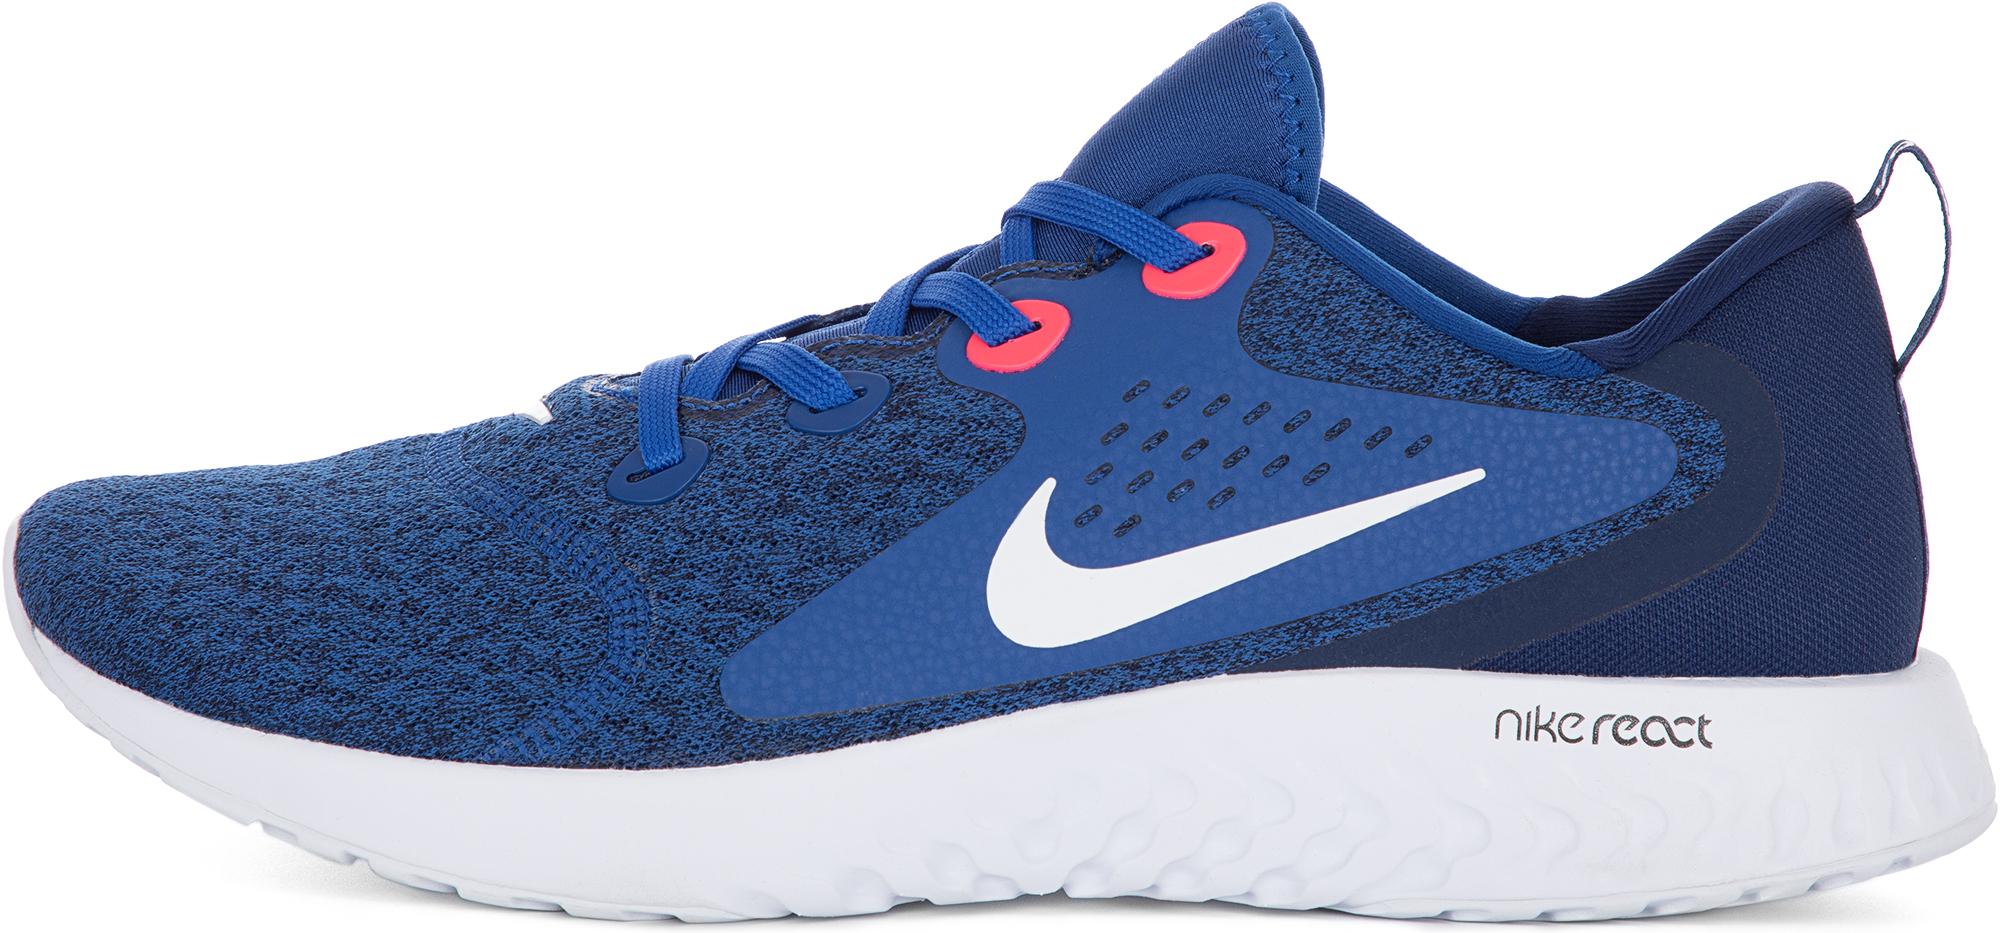 Nike Кроссовки мужские Nike Legend React, размер 43 nike nike legend ti poly capri drft